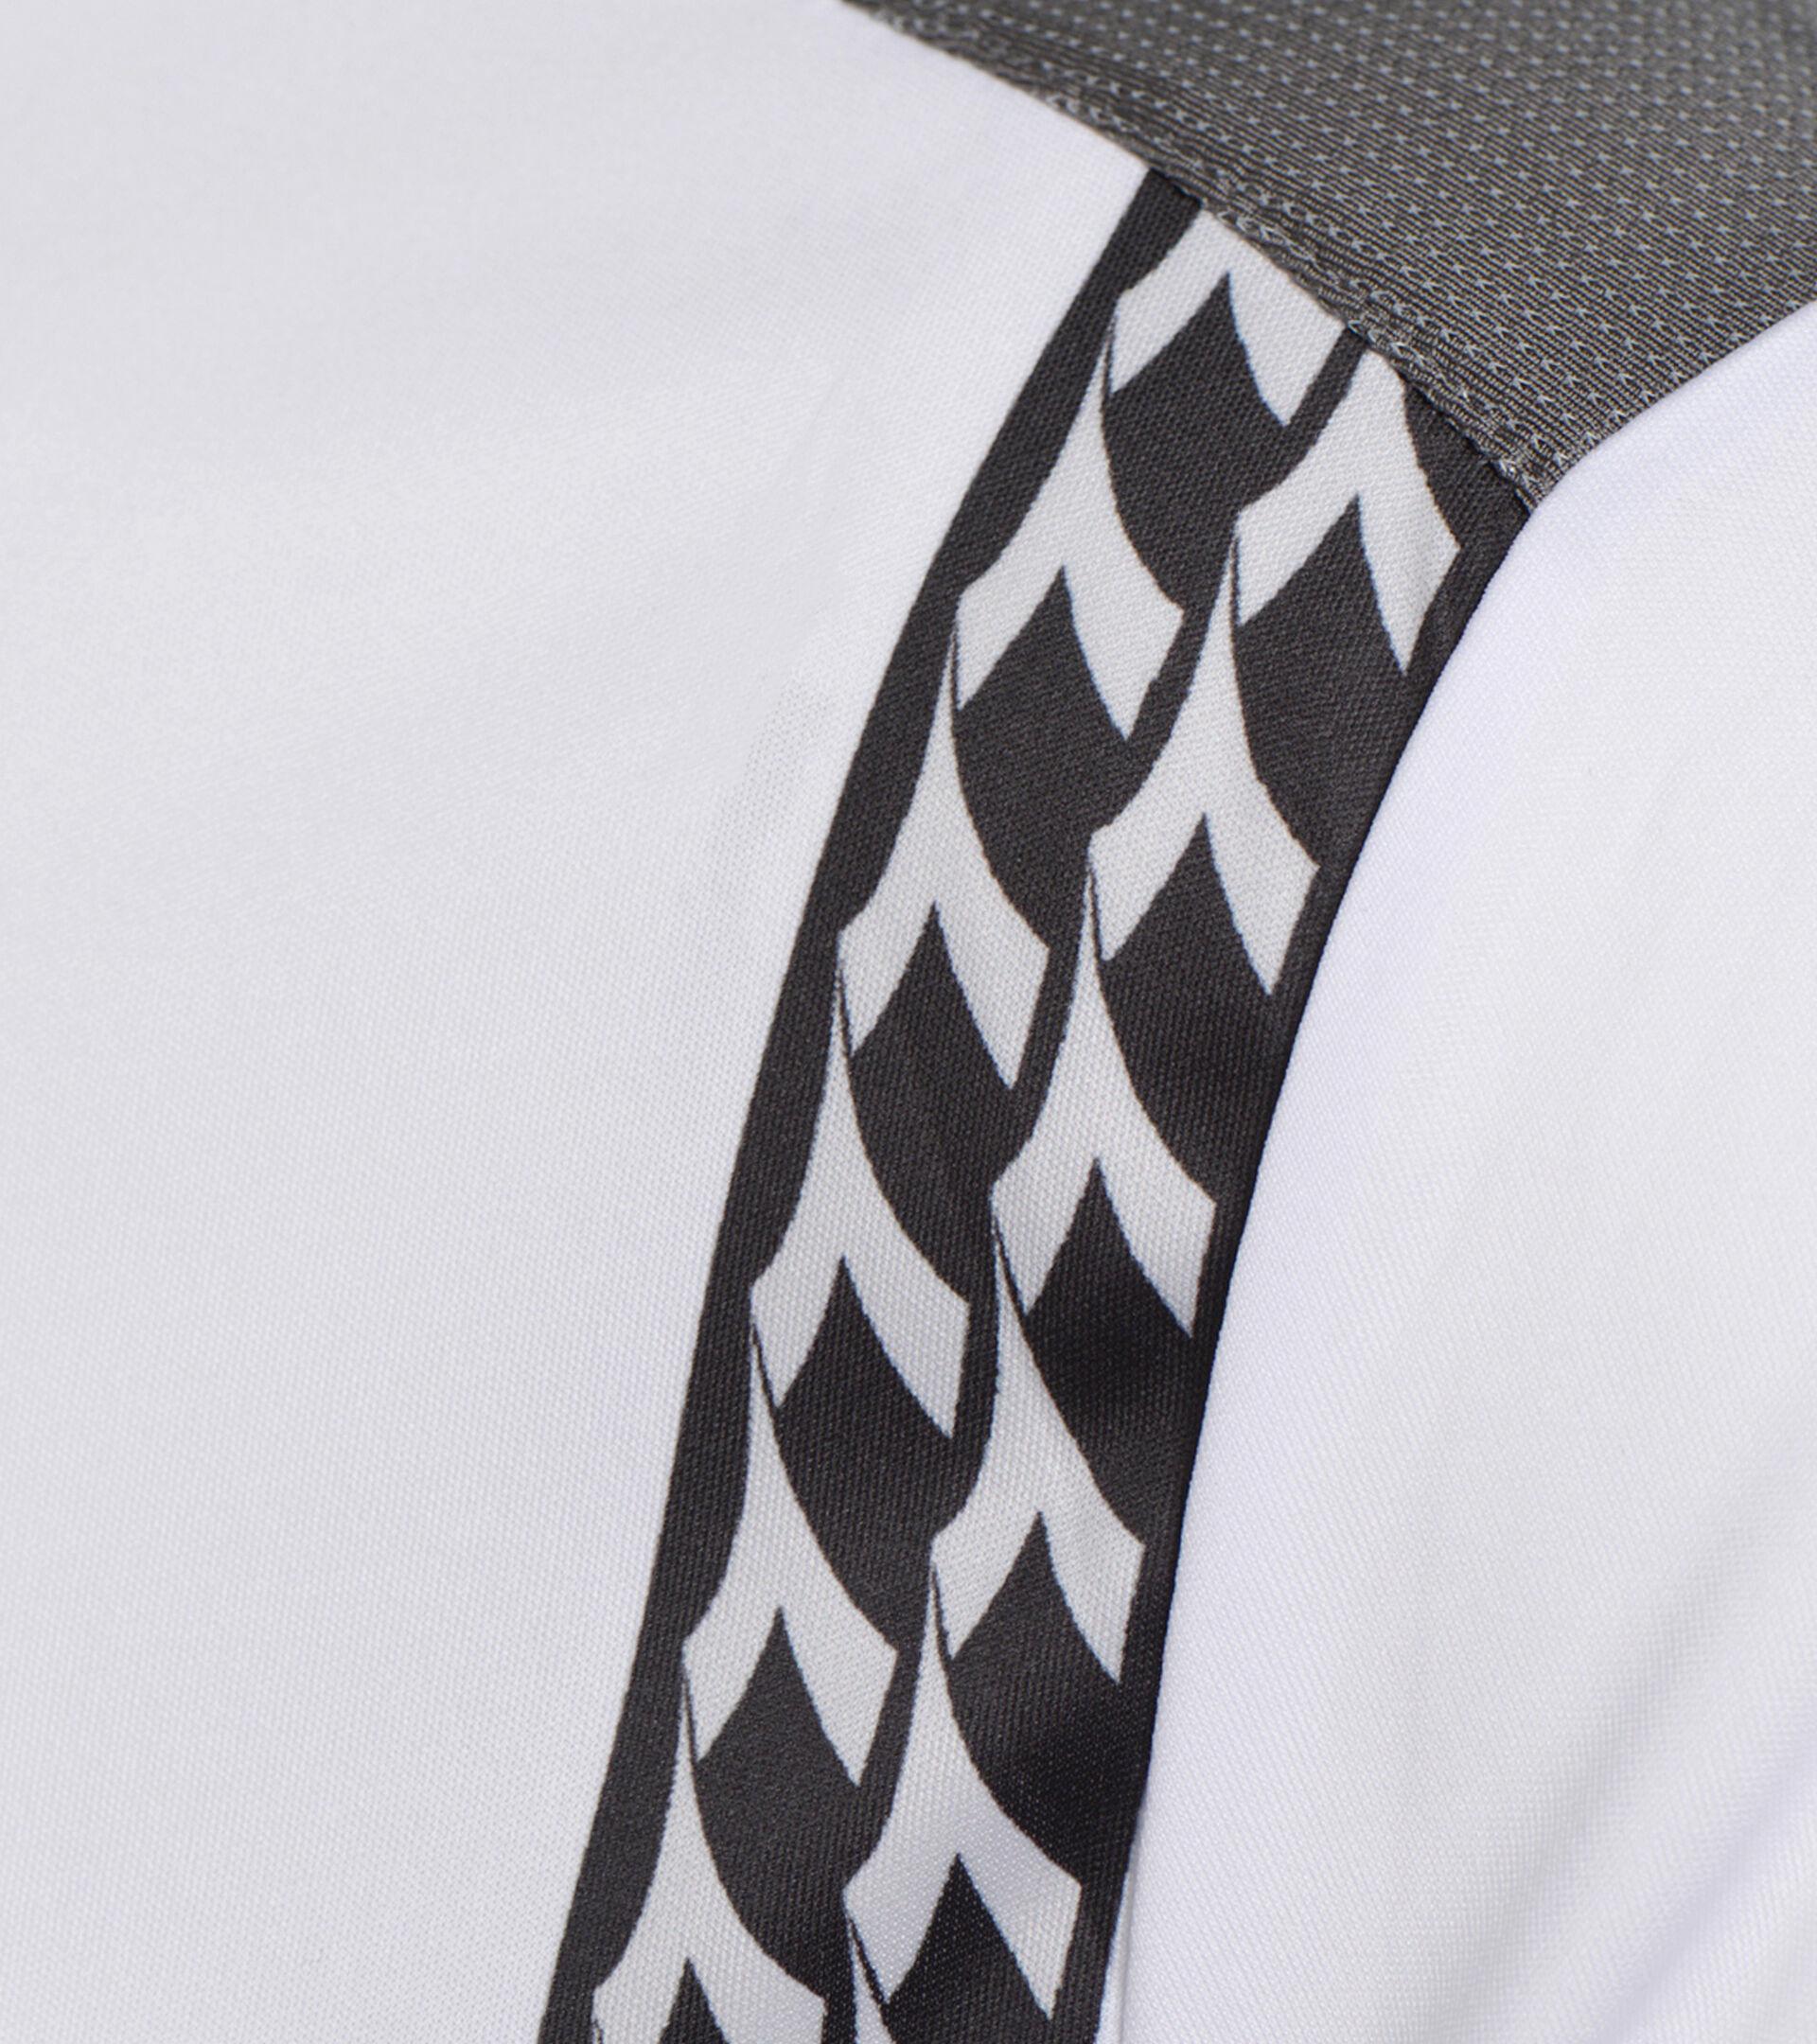 Tennis-T-Shirt - Herren SS T-SHIRT CHALLENGE STRAHLEND WEISSE - Diadora